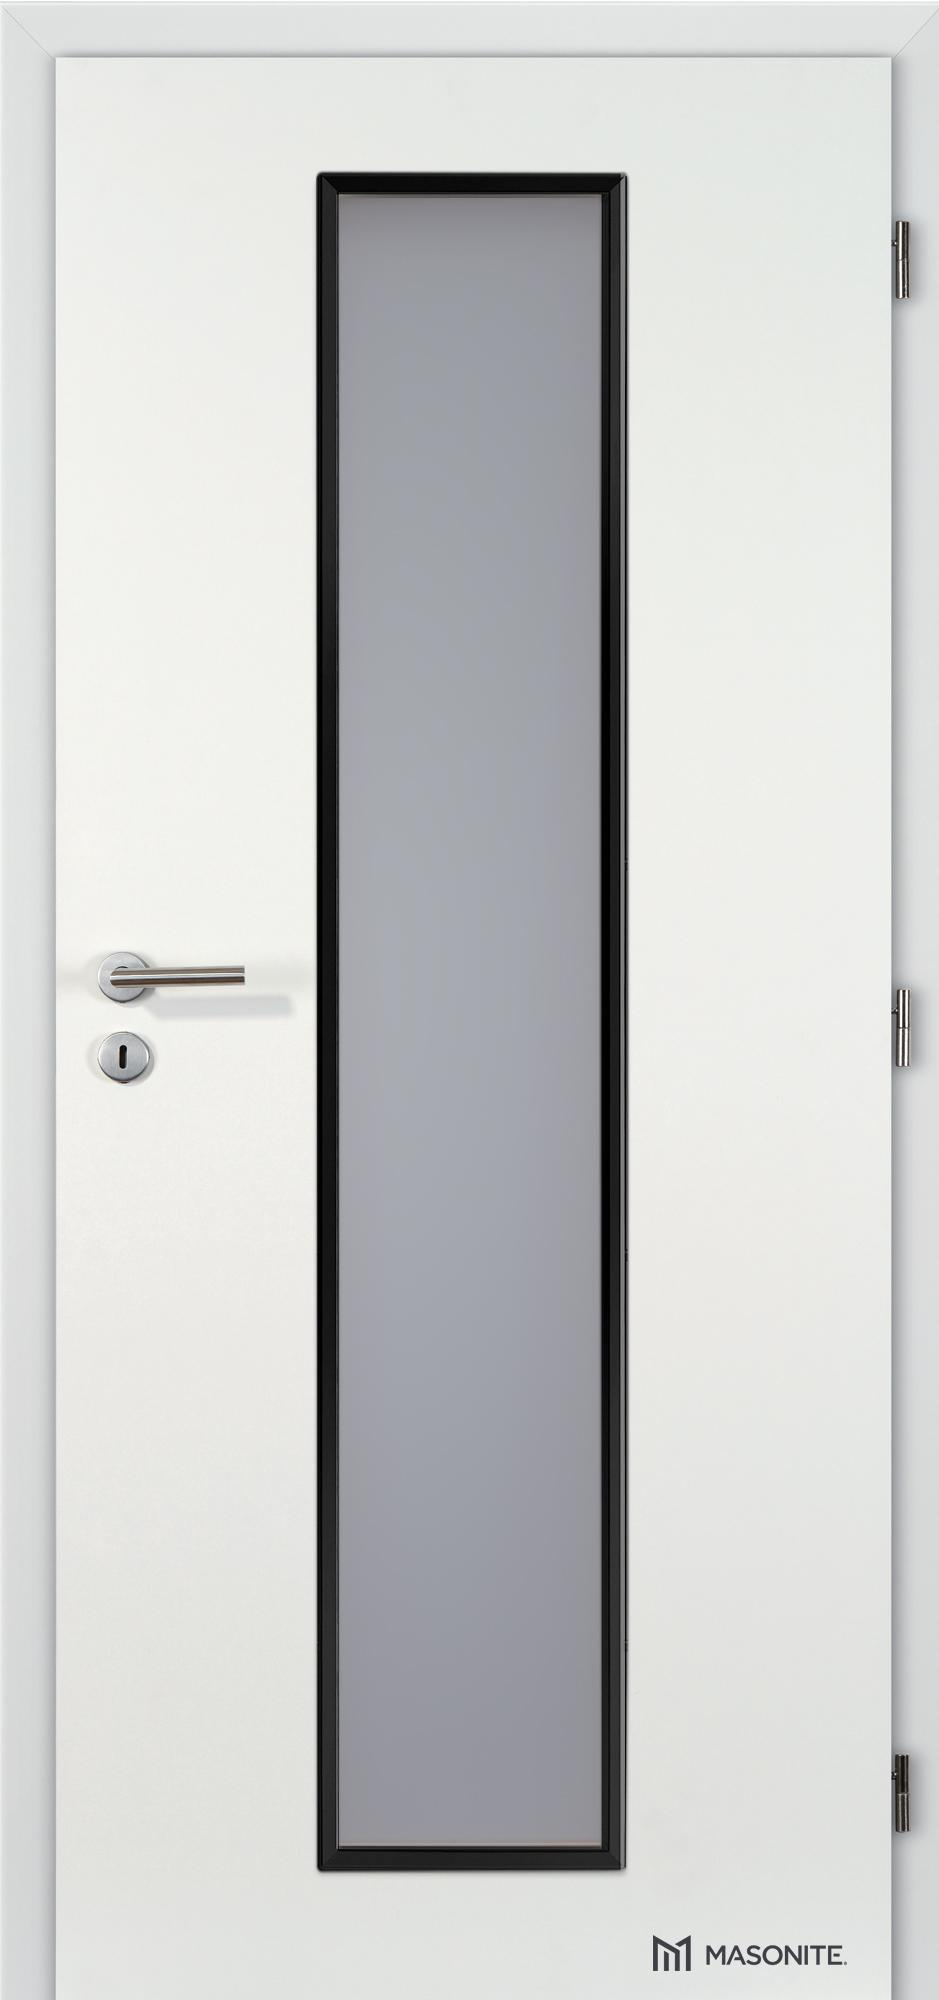 MASONITE - interiérové dveře PUR LINEA